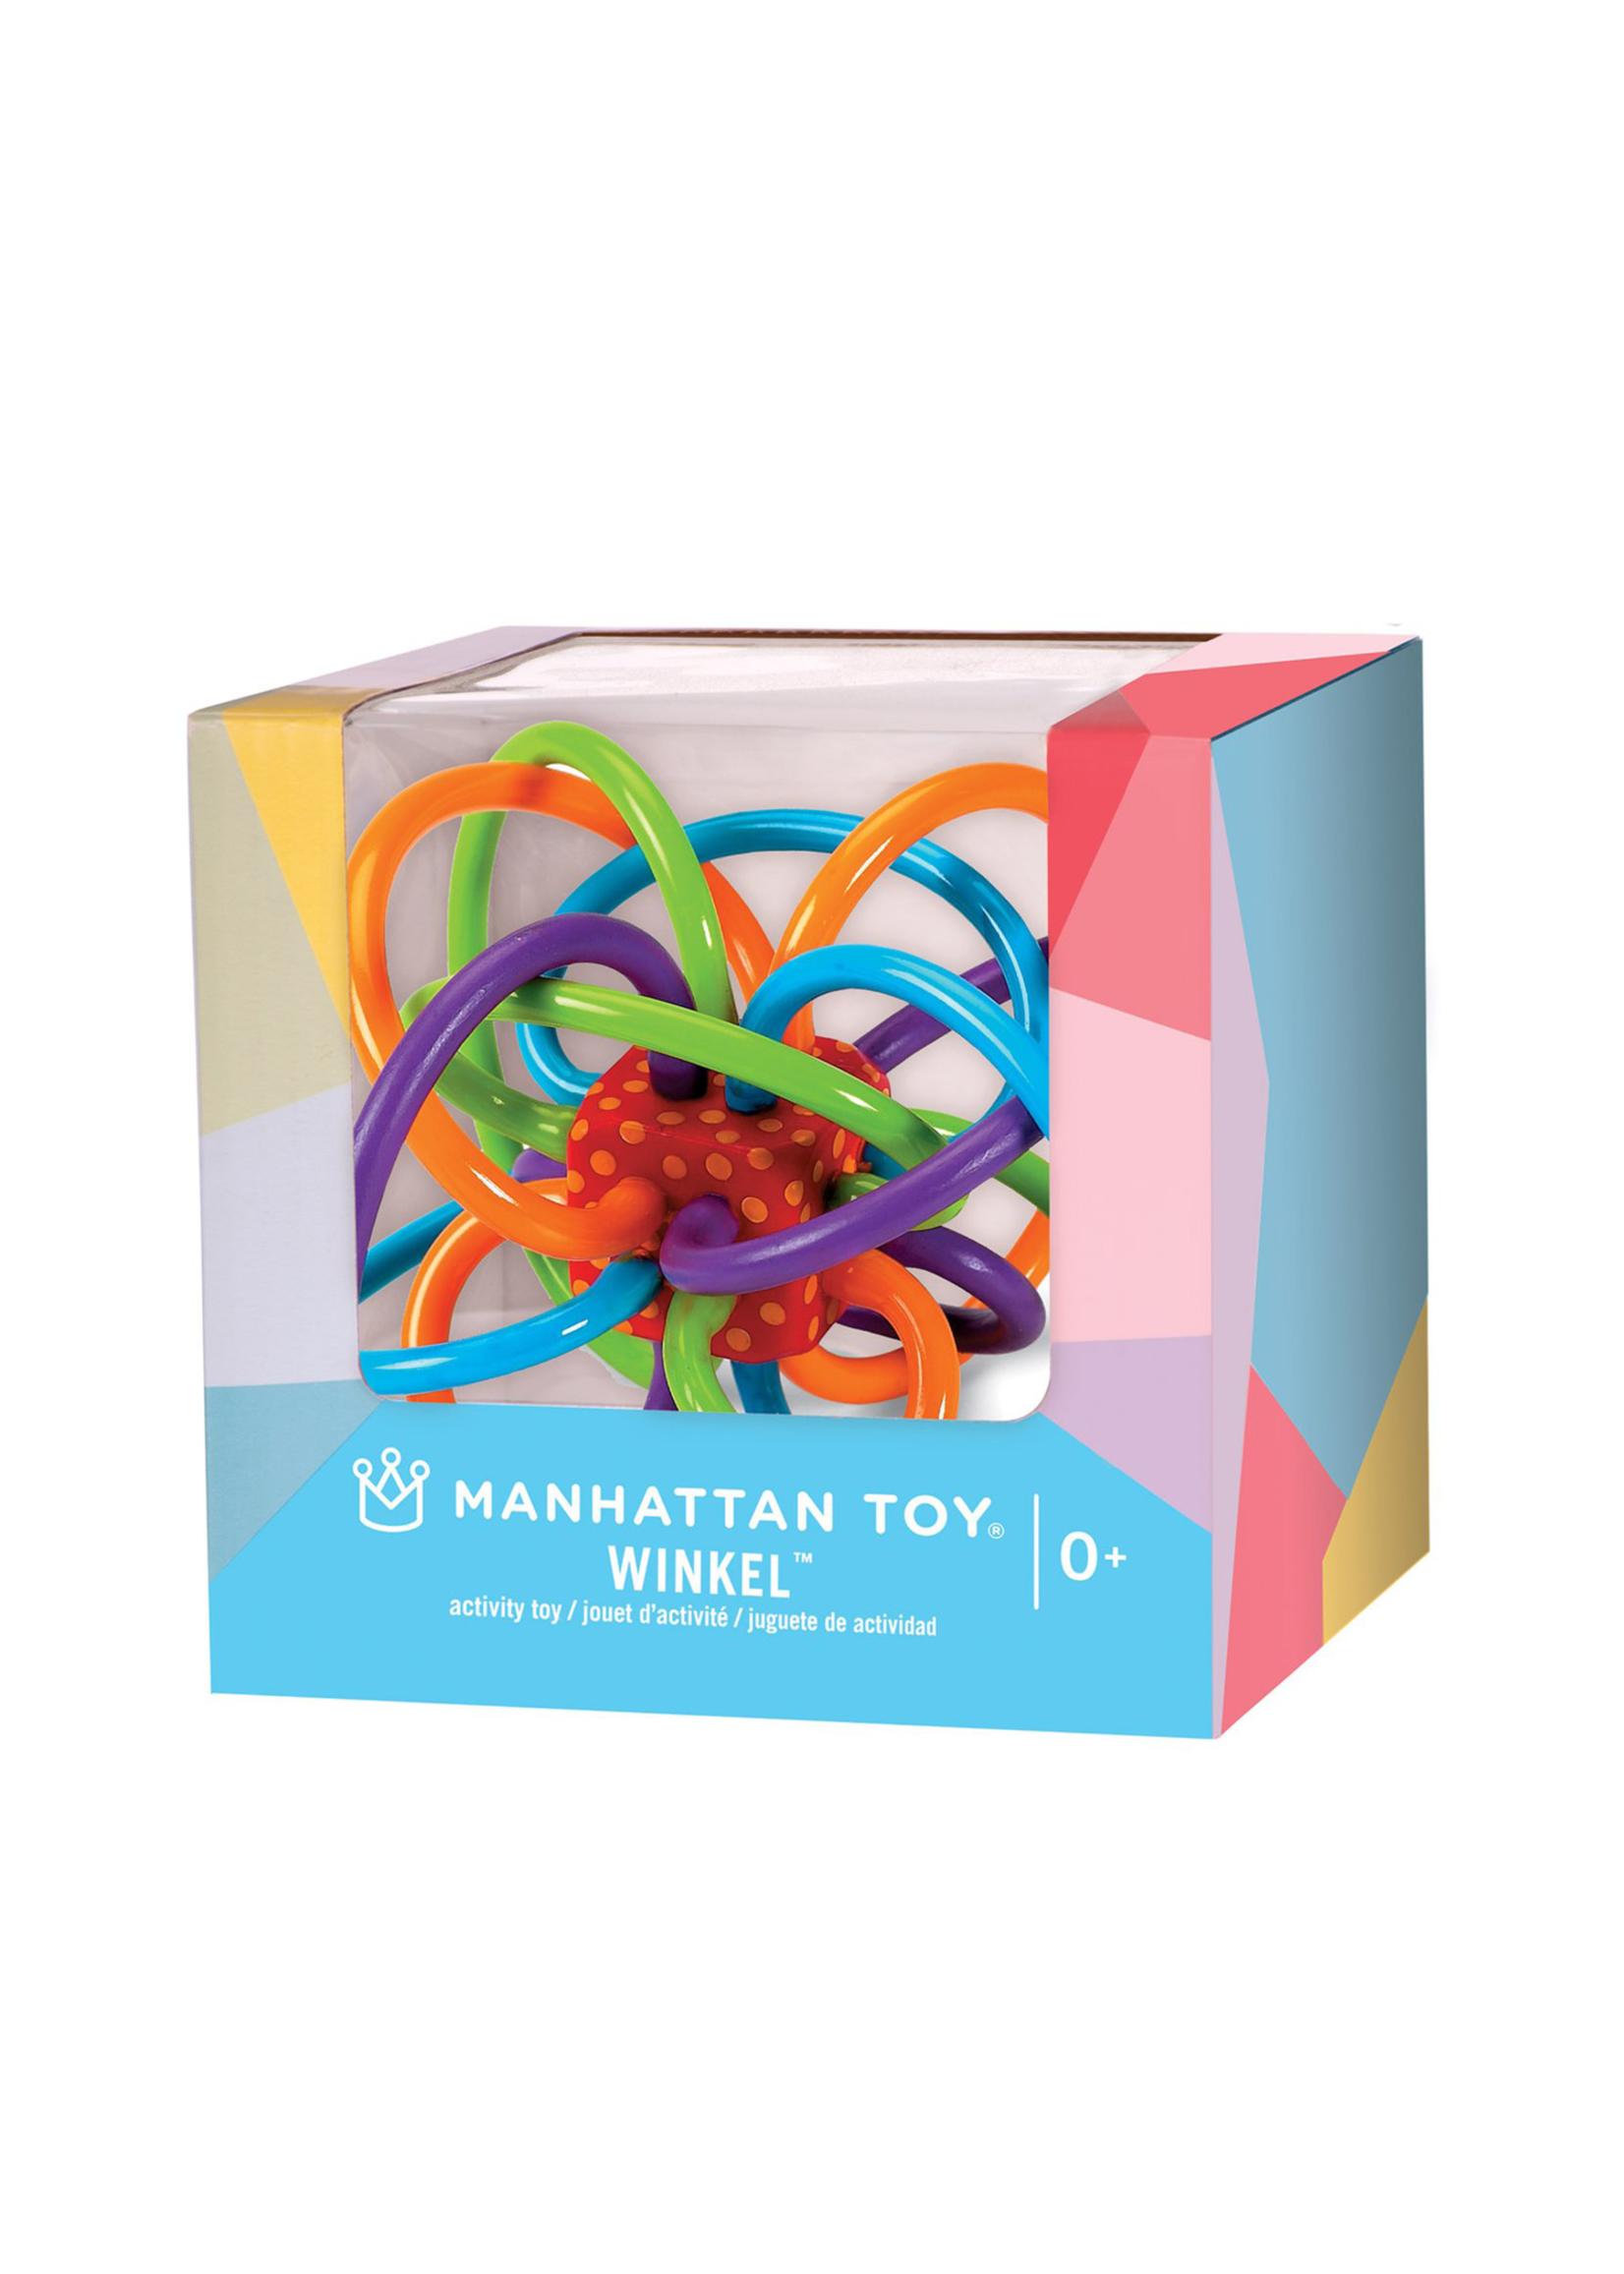 Manhattan Toy Winkel Classic Boxed